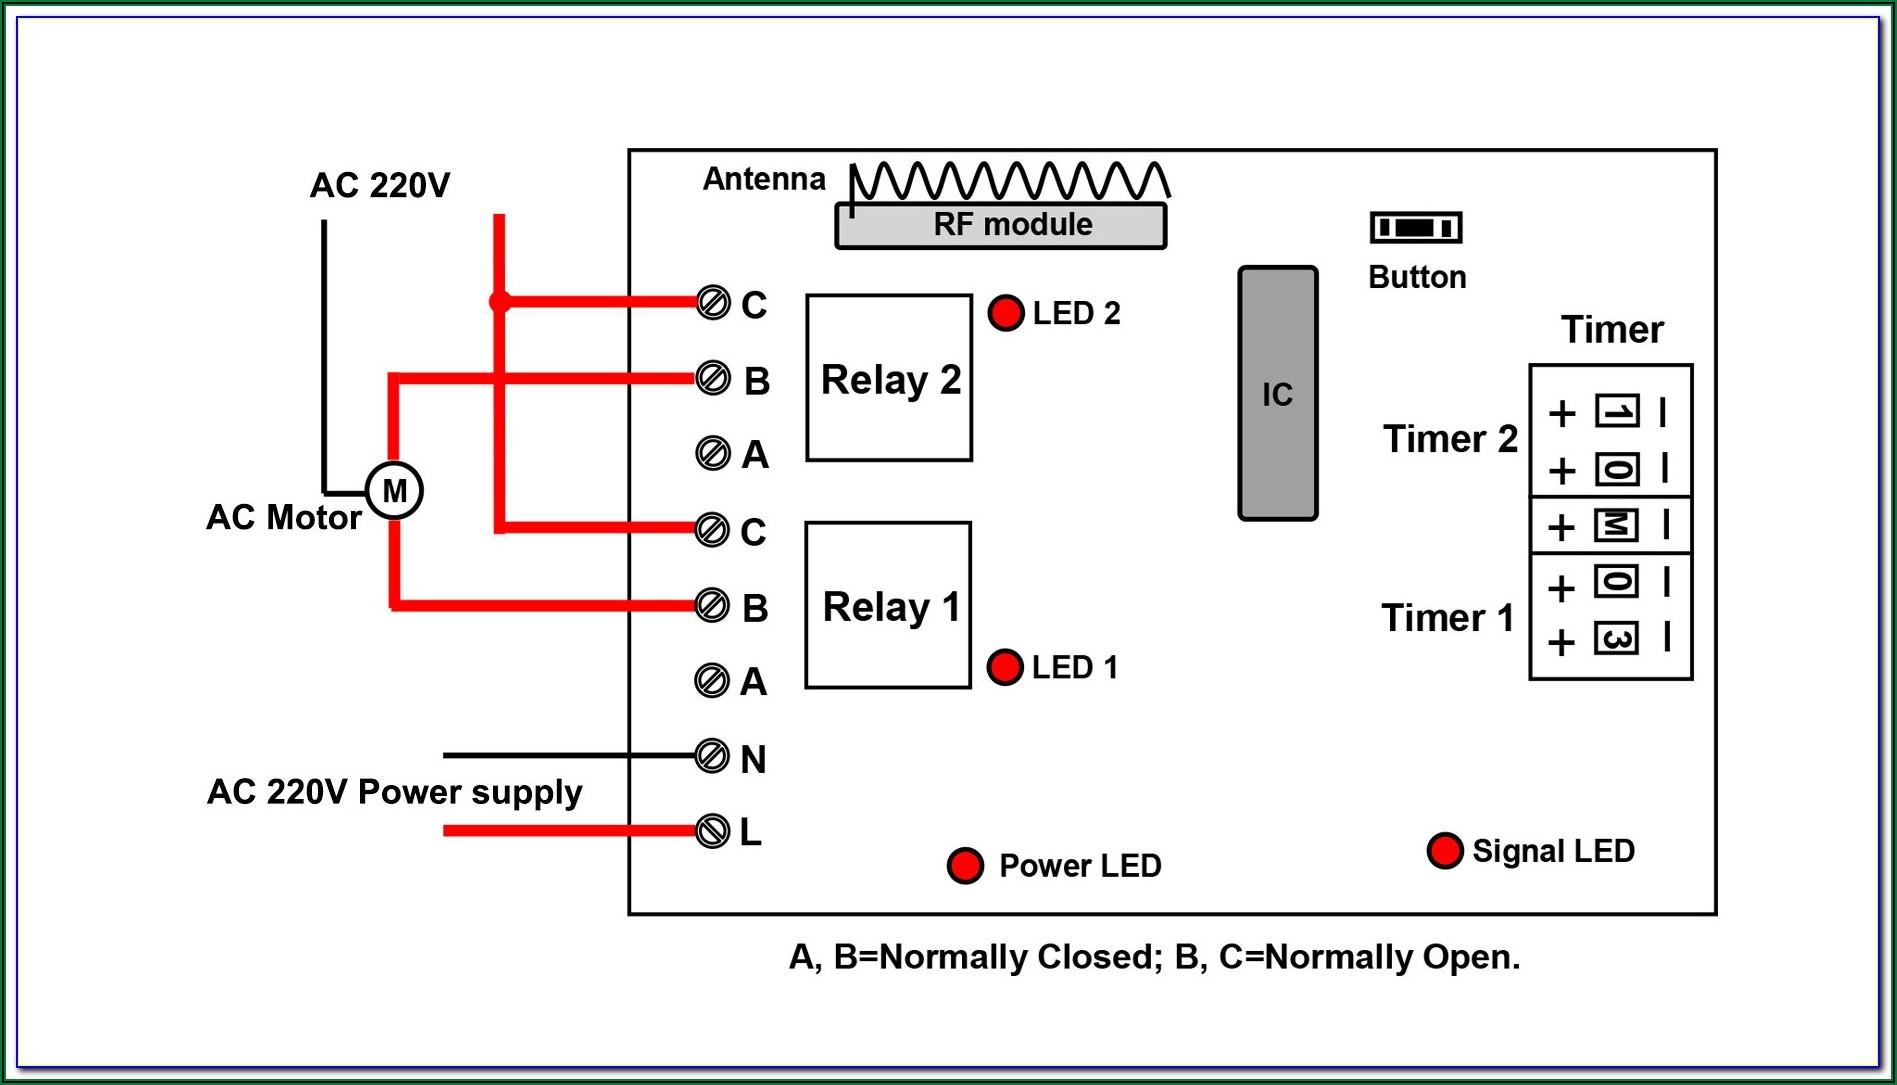 Air Compressor Wiring Diagram 230v 1 Phase